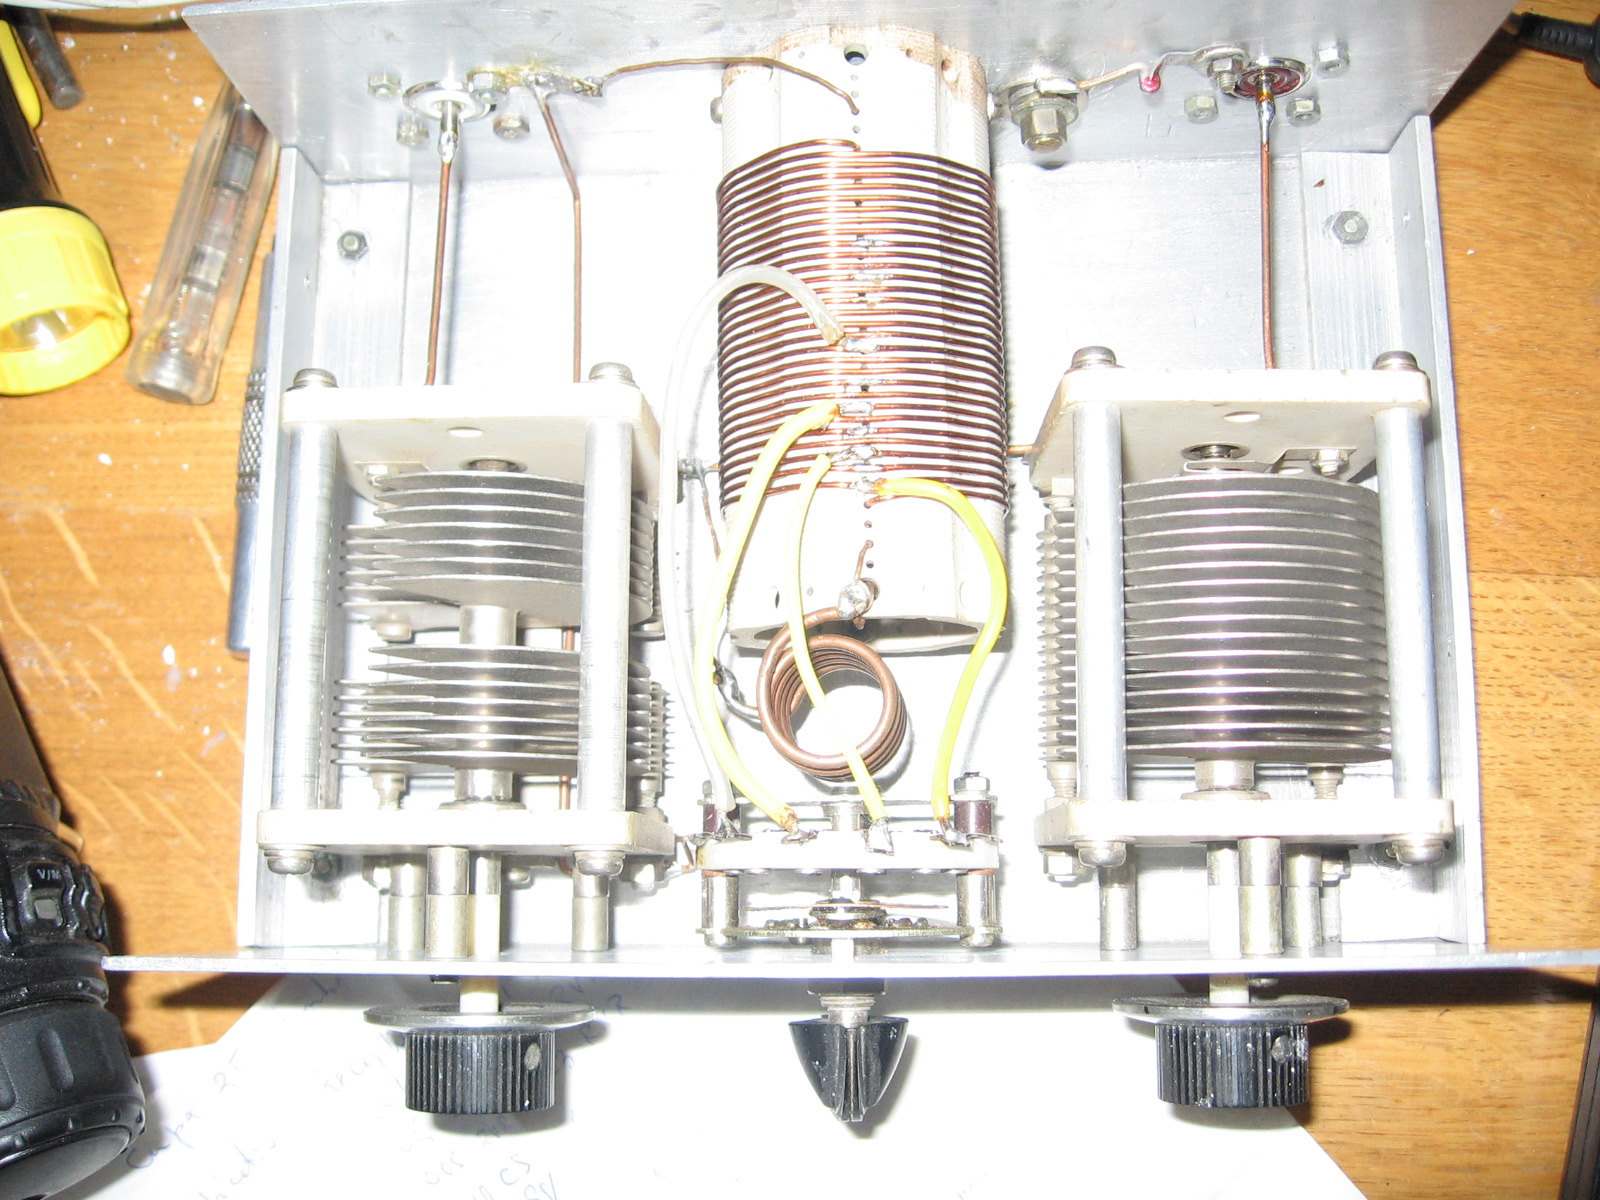 41221 furthermore General Electric 219 November 1946 Radio News also FC Consumer as well Radio Tuner Schematic furthermore American Bosch 524a Schematic Radio Craft June 1935. on philco radio schematics